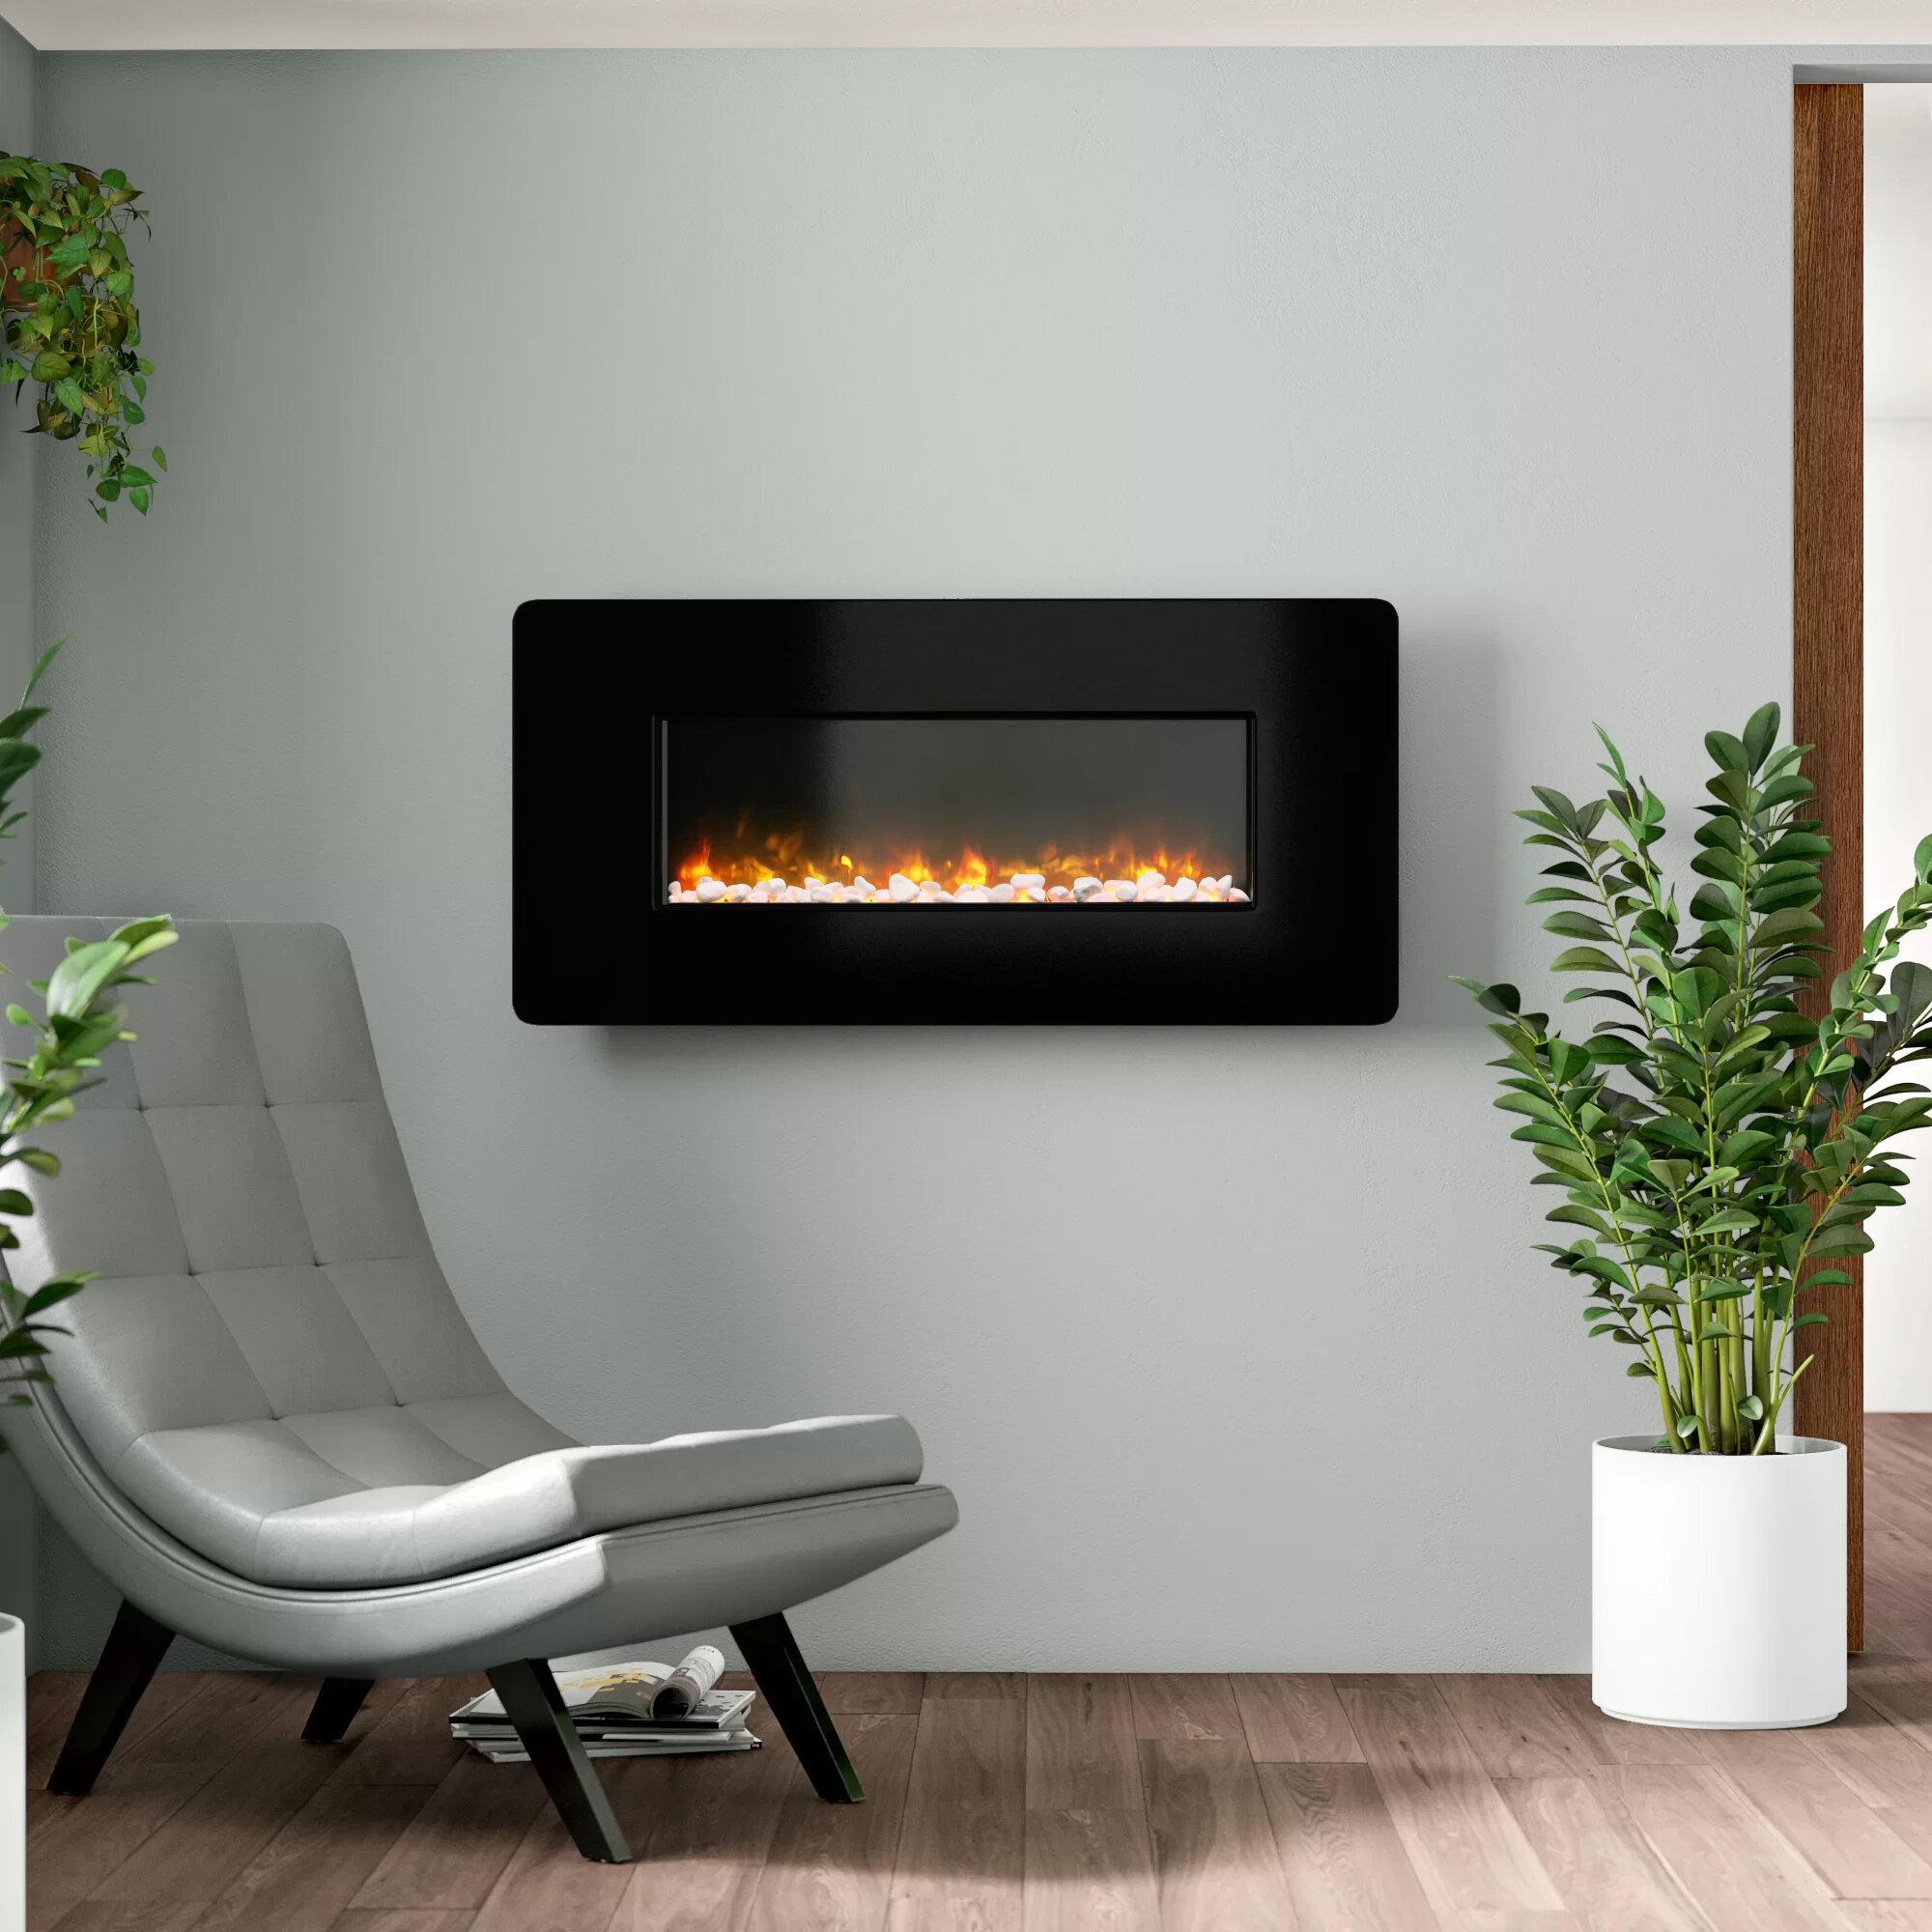 Ebern Designs Stockwell Electric Fireplace Reviews Wayfair